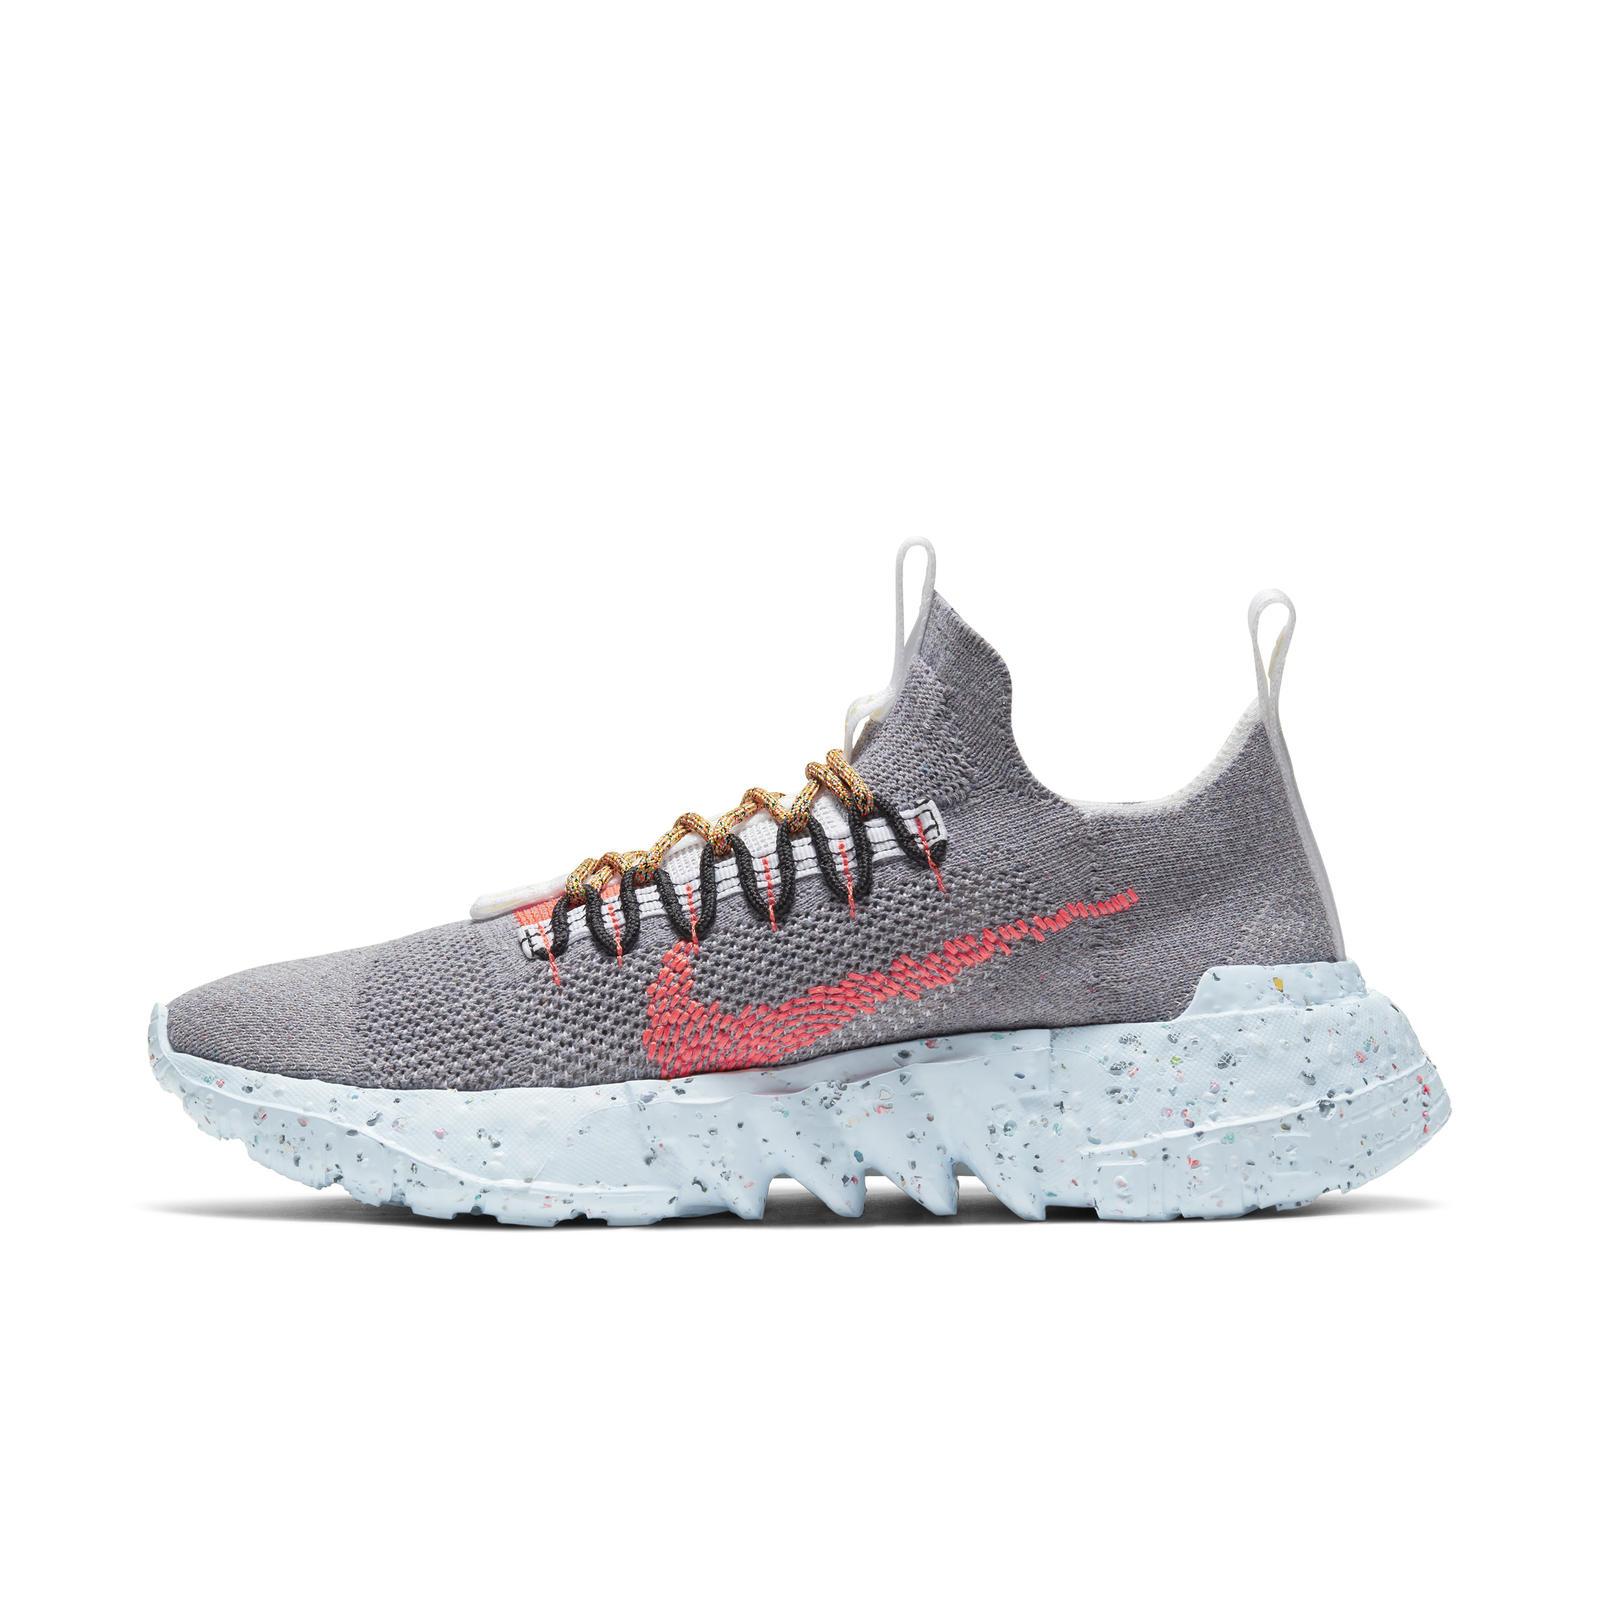 Nikeがリサイクル素材を用いた新作フットウェアコレクションを発売!